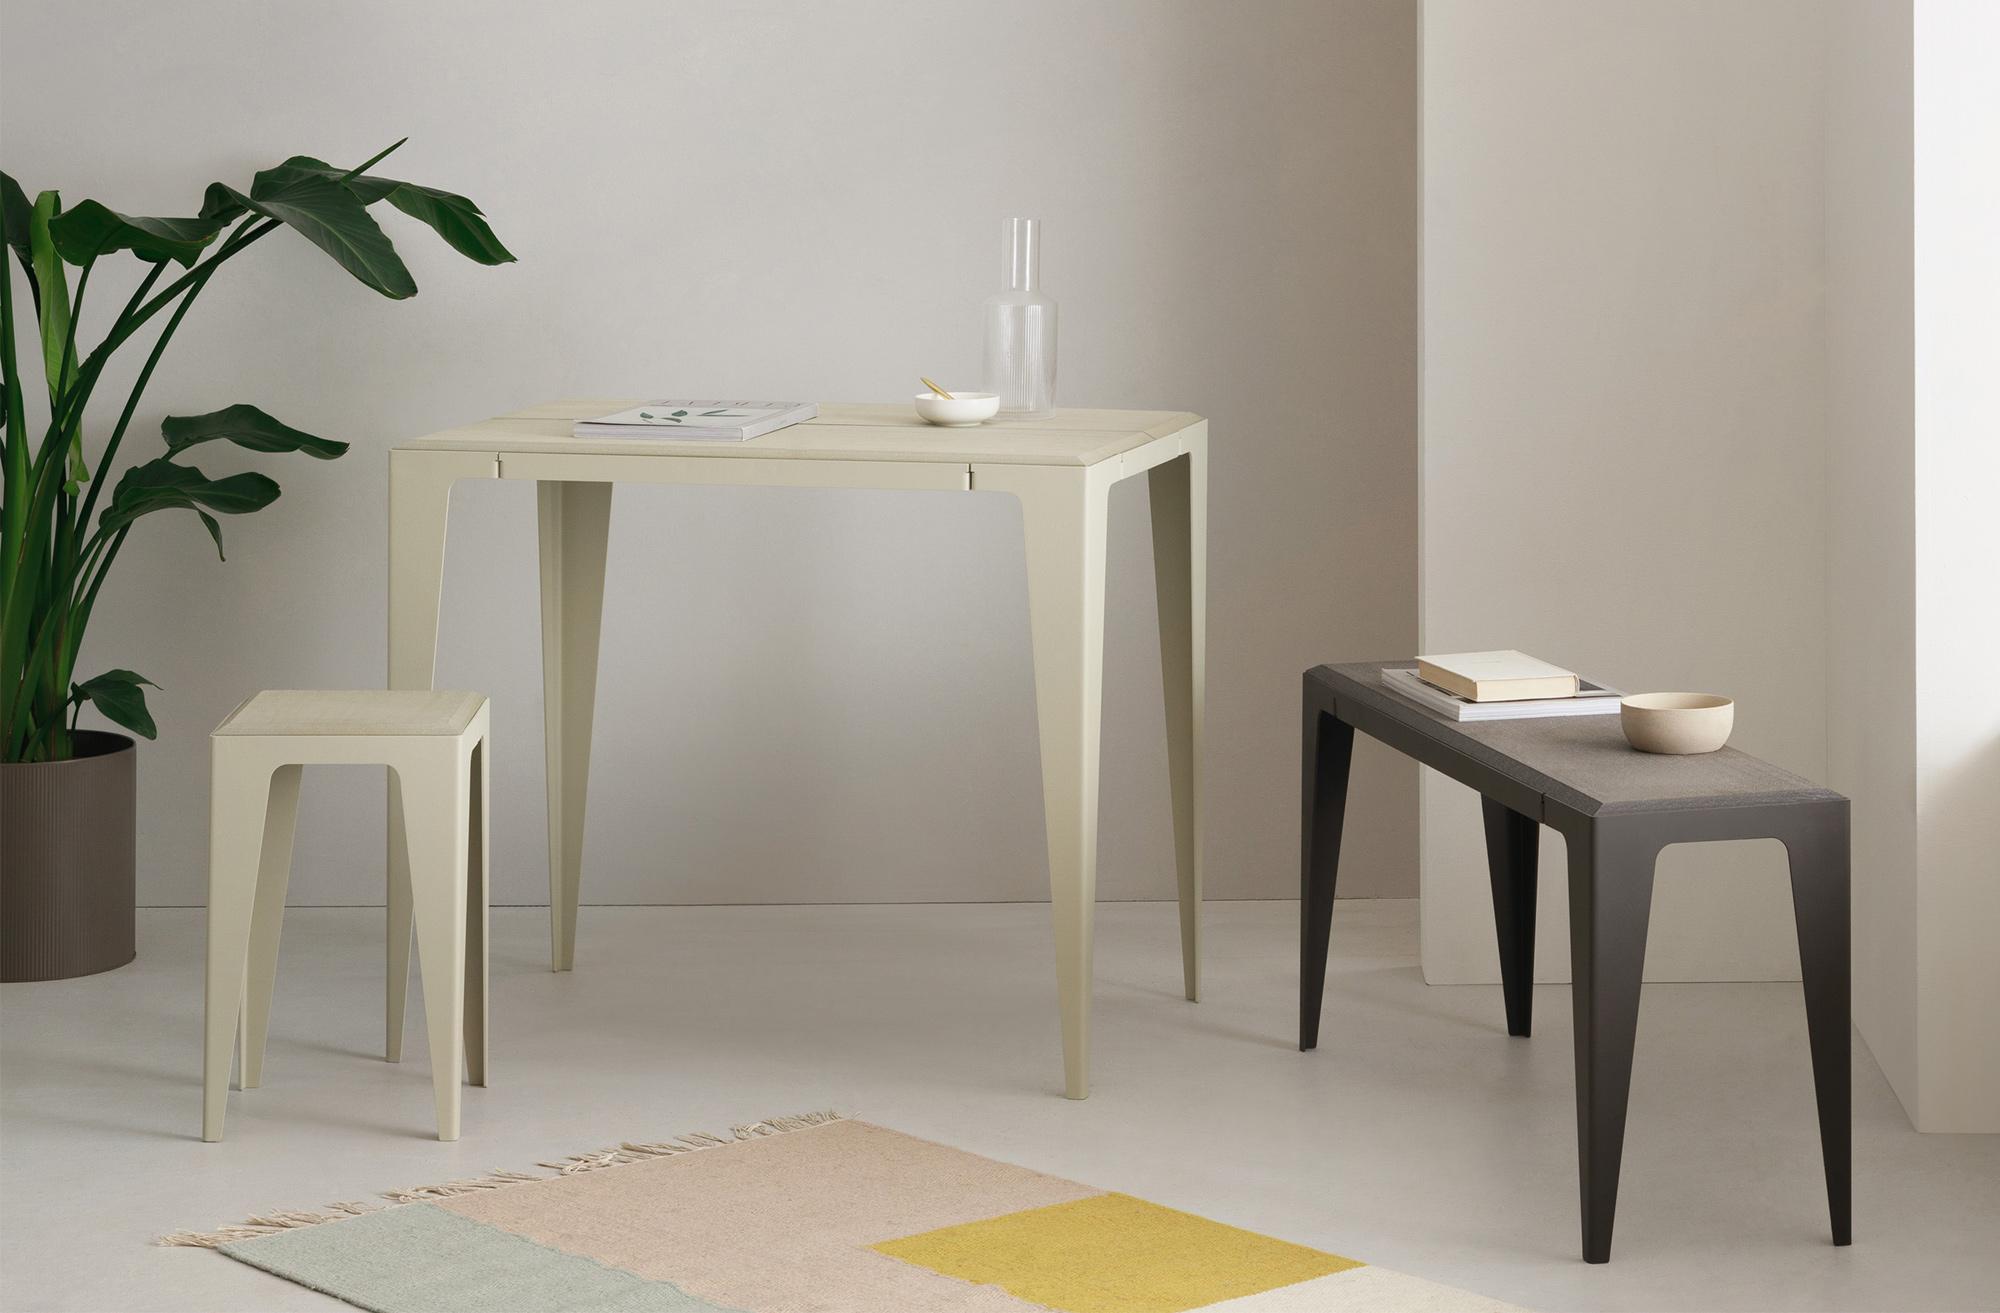 Möbel von WYE // Fotocredits: WYE GmbH